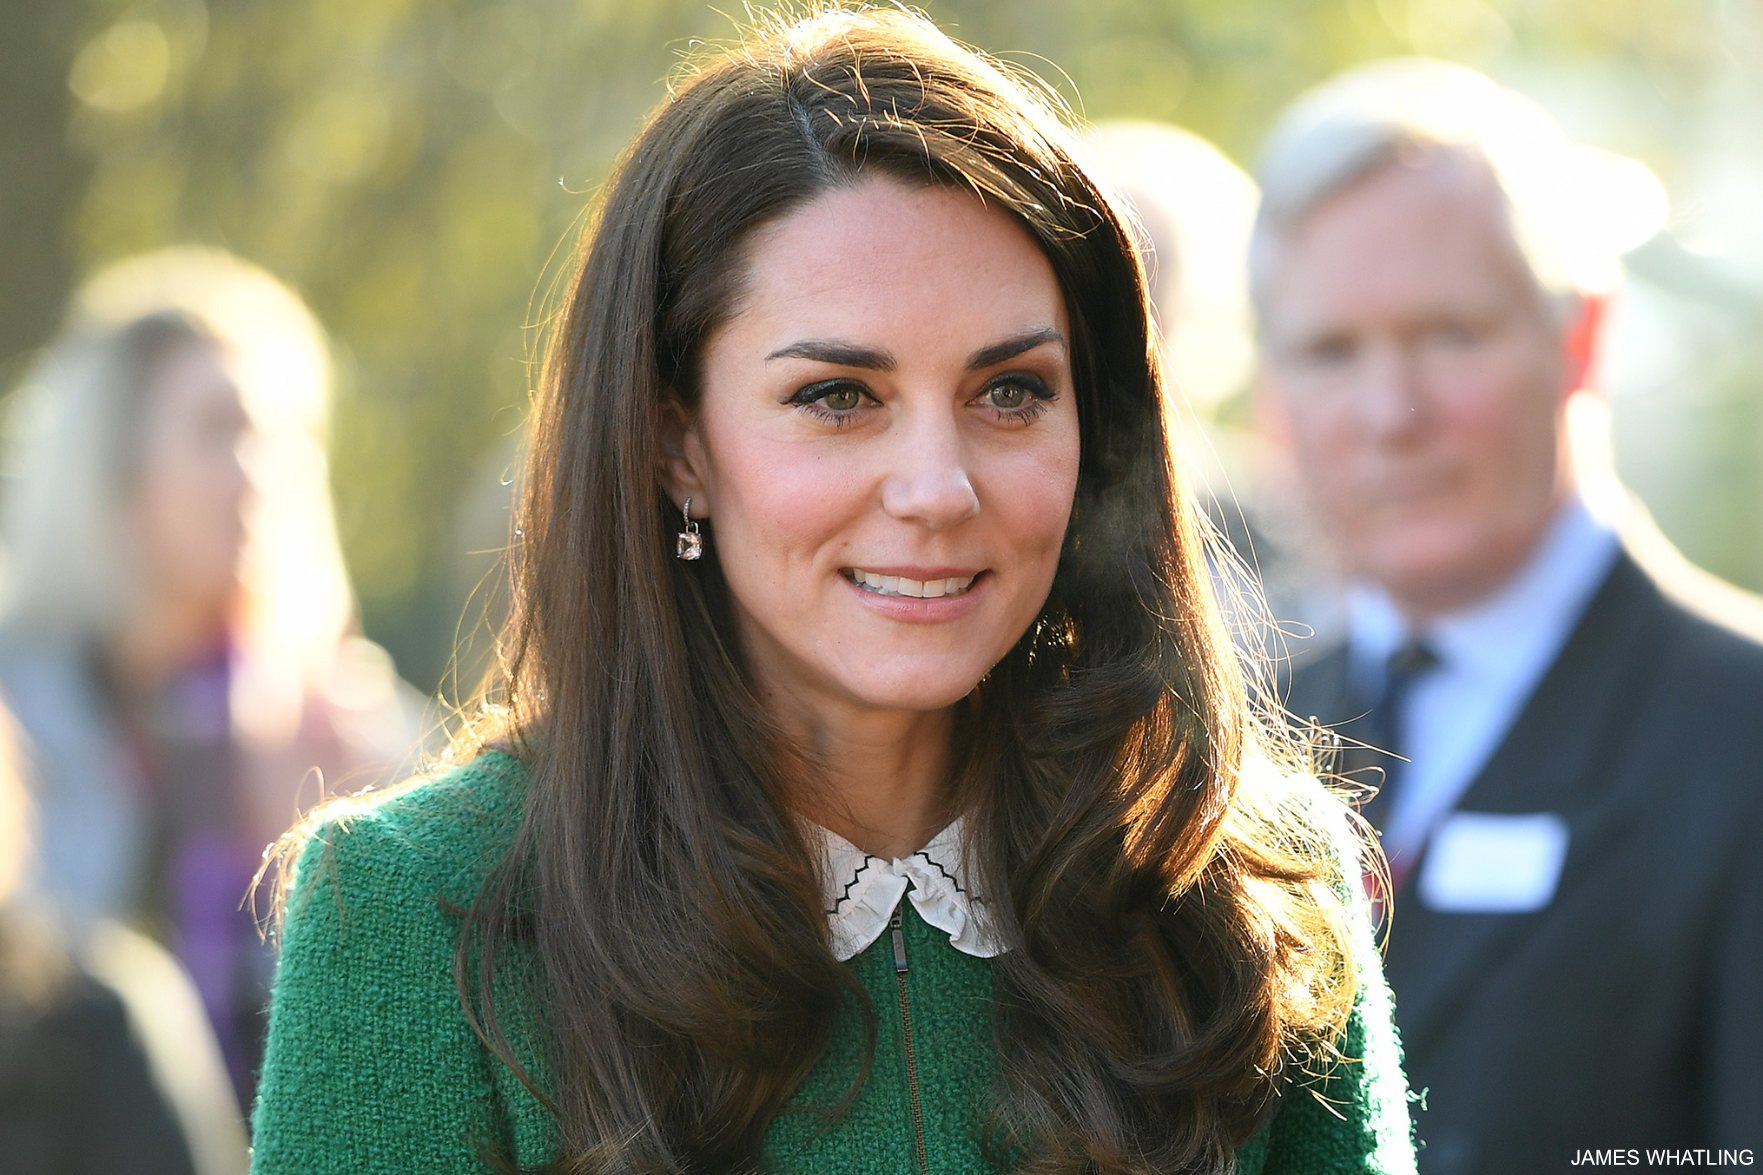 Znalezione obrazy dla zapytania duchess kate quidenham